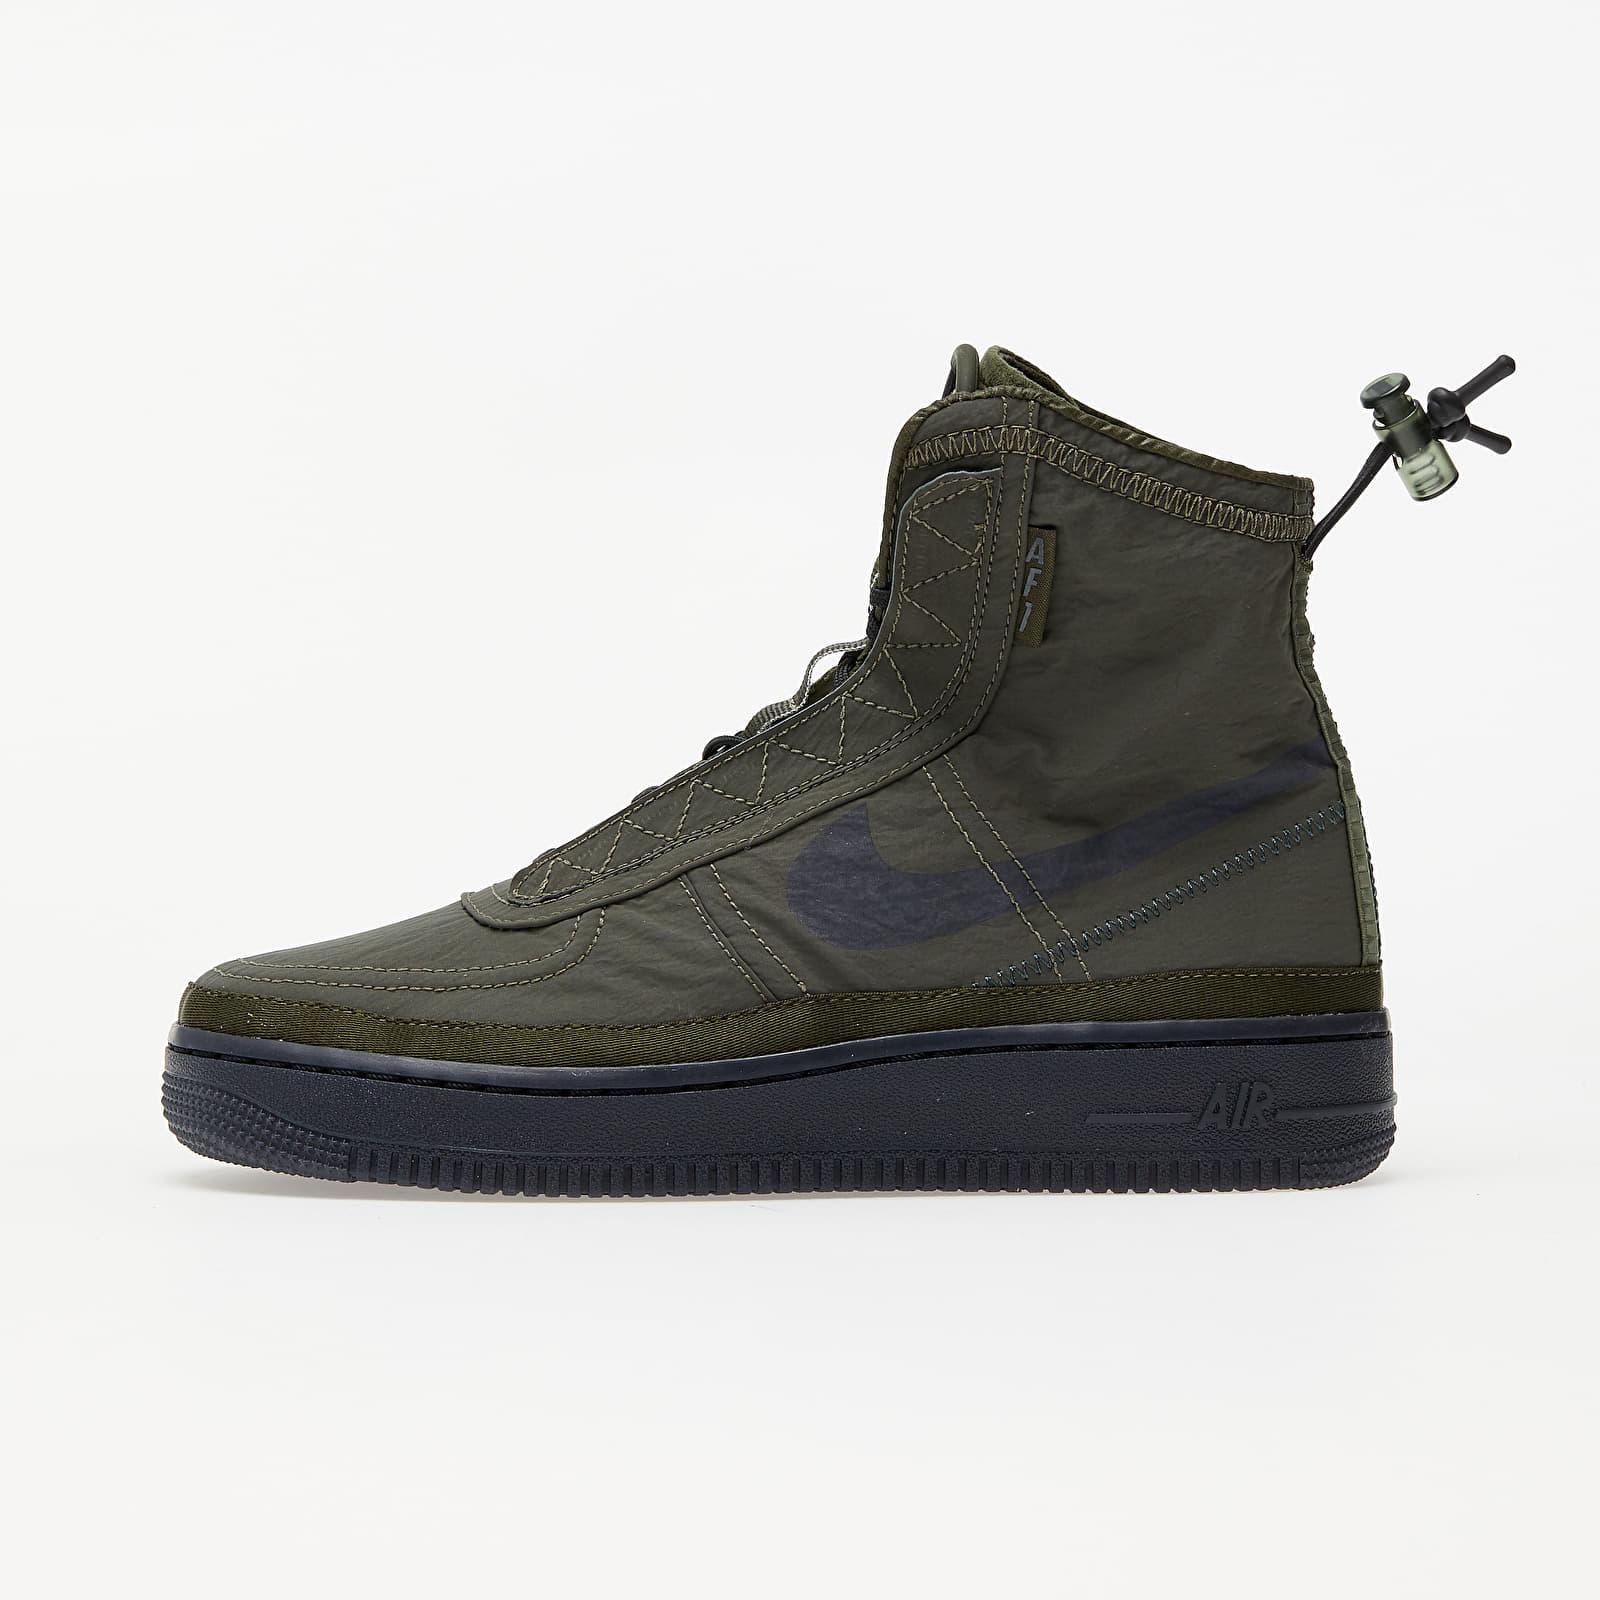 Women's shoes Nike W Air Force 1 Shell Cargo Khaki/ Off Noir-Seaweed